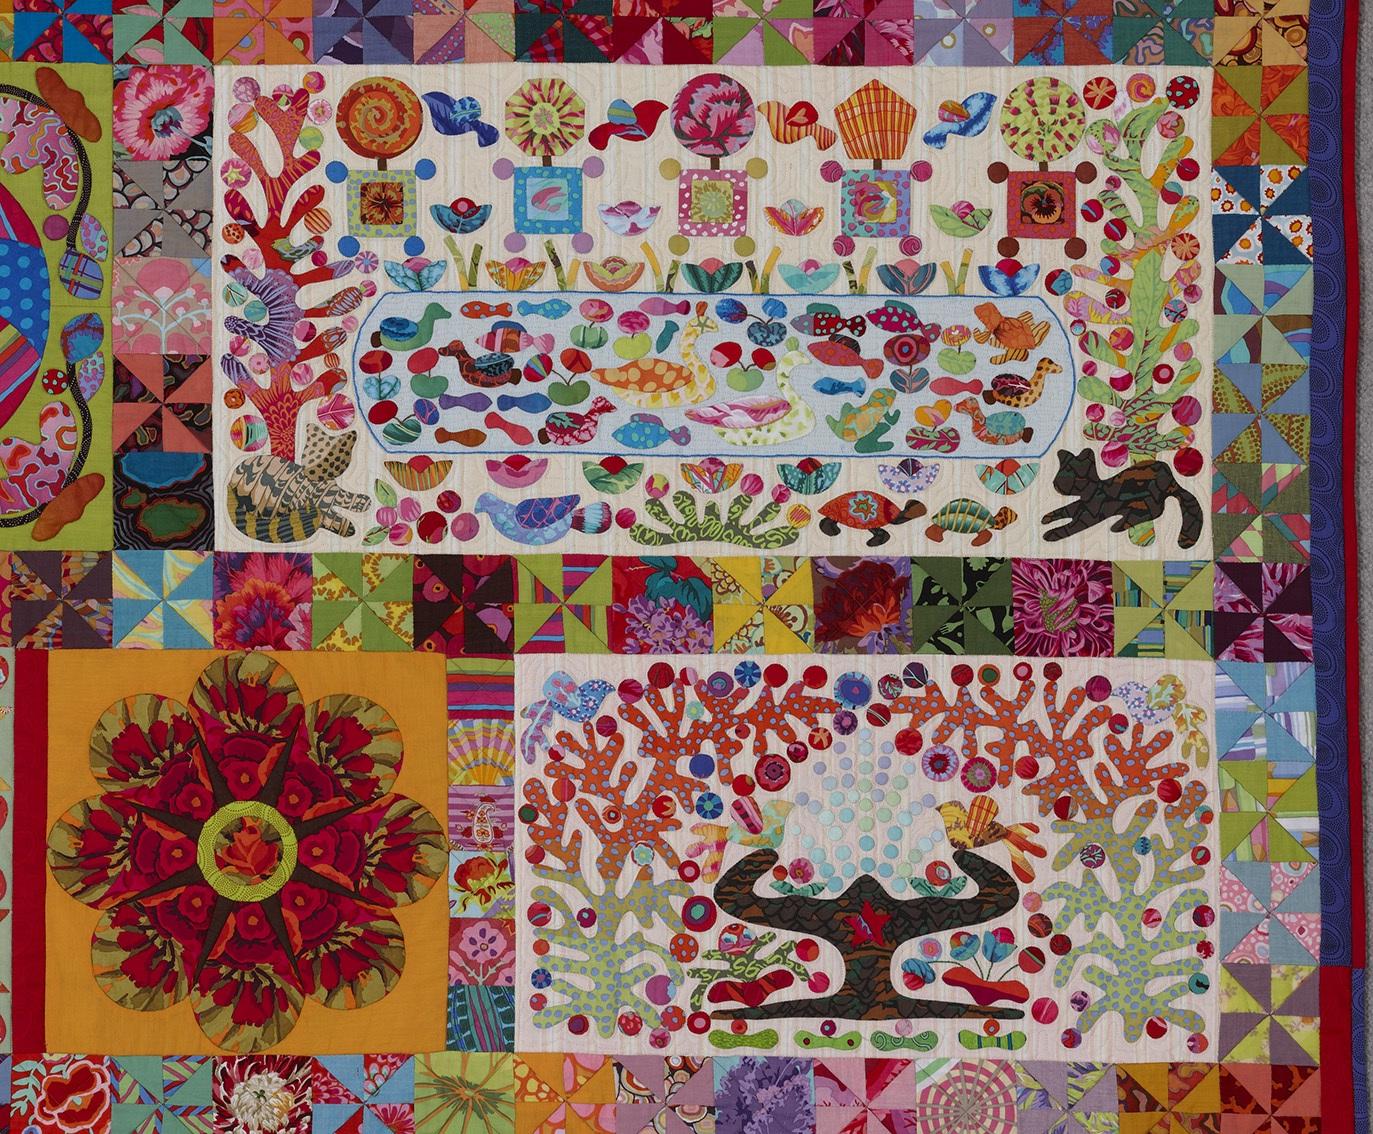 Glorious Applique: Applique tutorials by Kim McLean : kim mclean quilts - Adamdwight.com